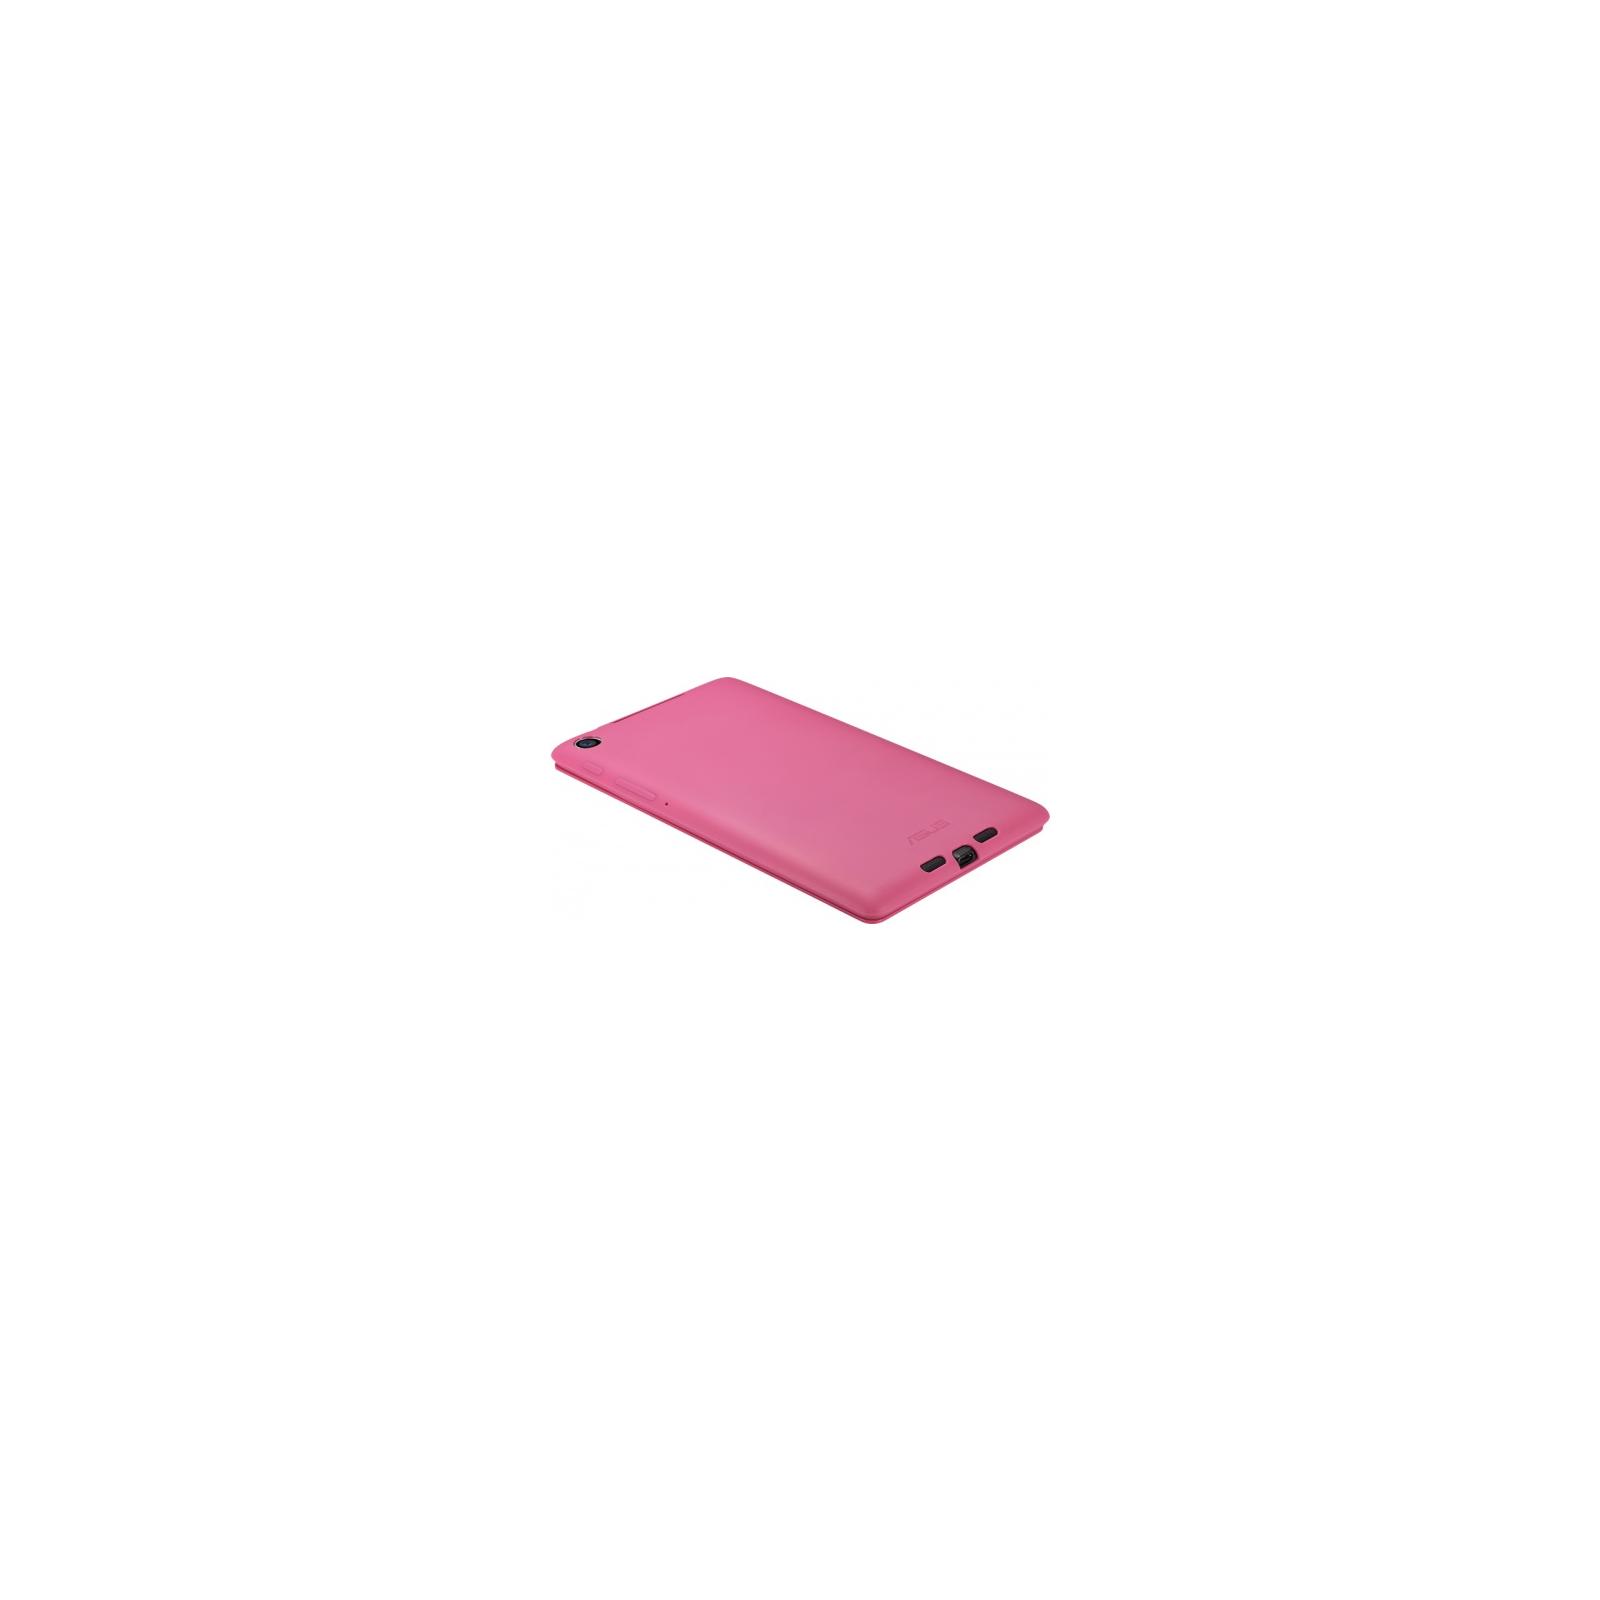 Чехол для планшета ASUS Nexus 7 2013 TRAVEL COVER V2 PINK (90-XB3TOKSL001P0-) изображение 6